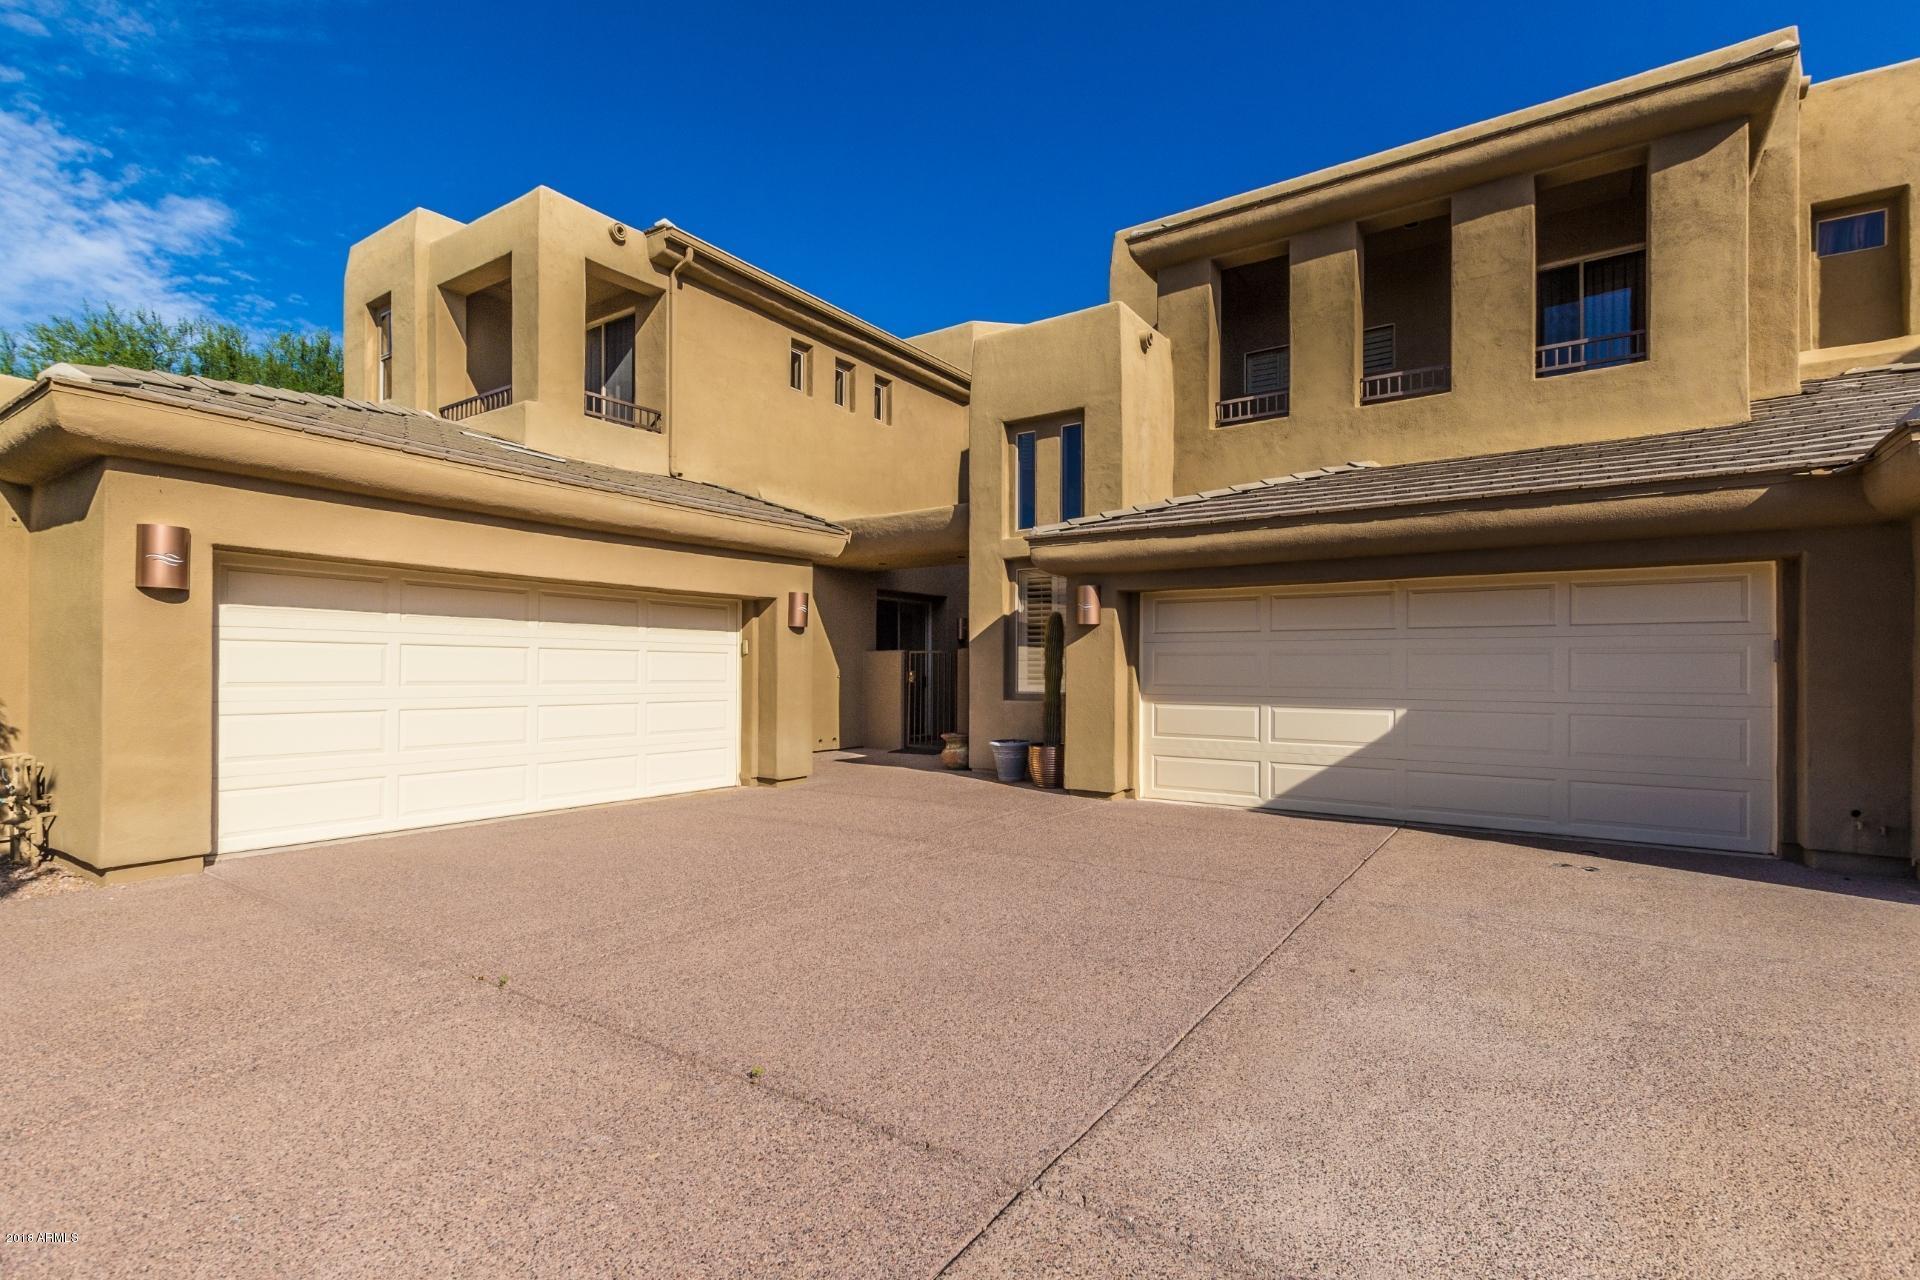 14850 E Grandview Drive, Unit 117, Fountain Hills AZ 85268 - Photo 2